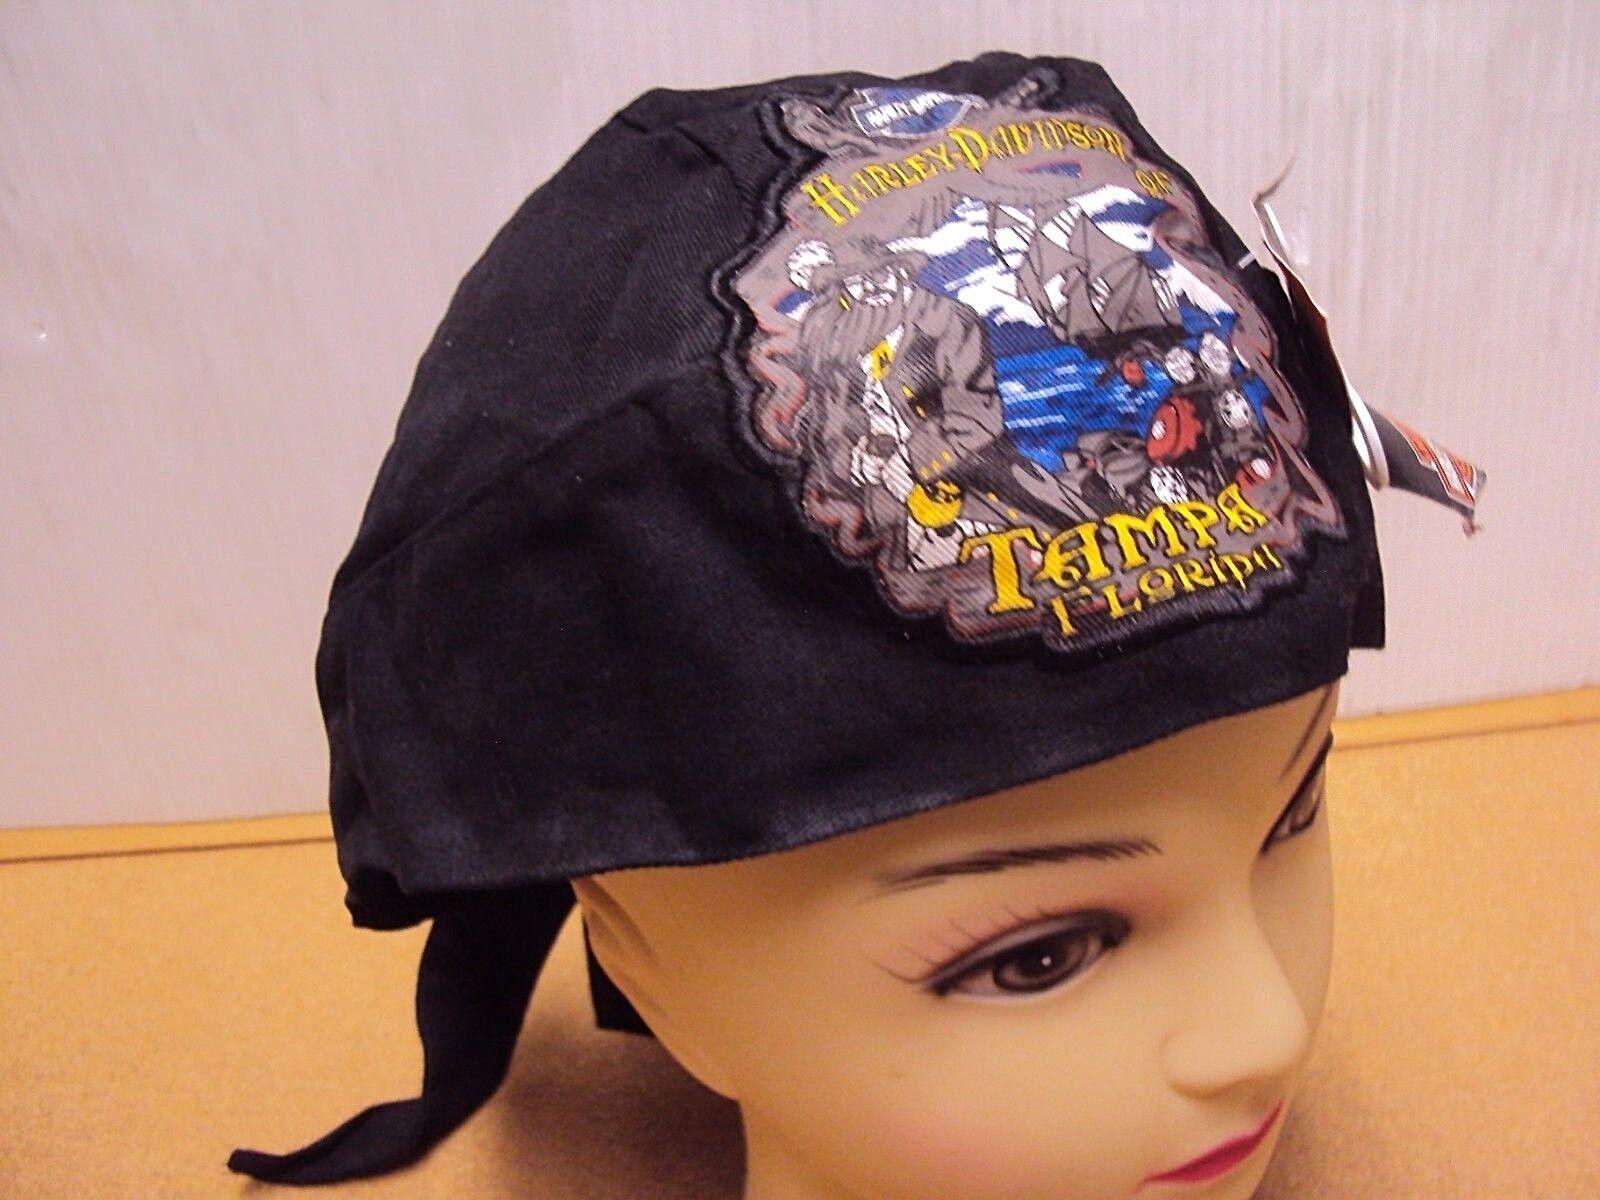 Harley-Davidson Du Rag Kopftuch Stirnband Totenkopf Kappe Hut Doo Tampa Florida